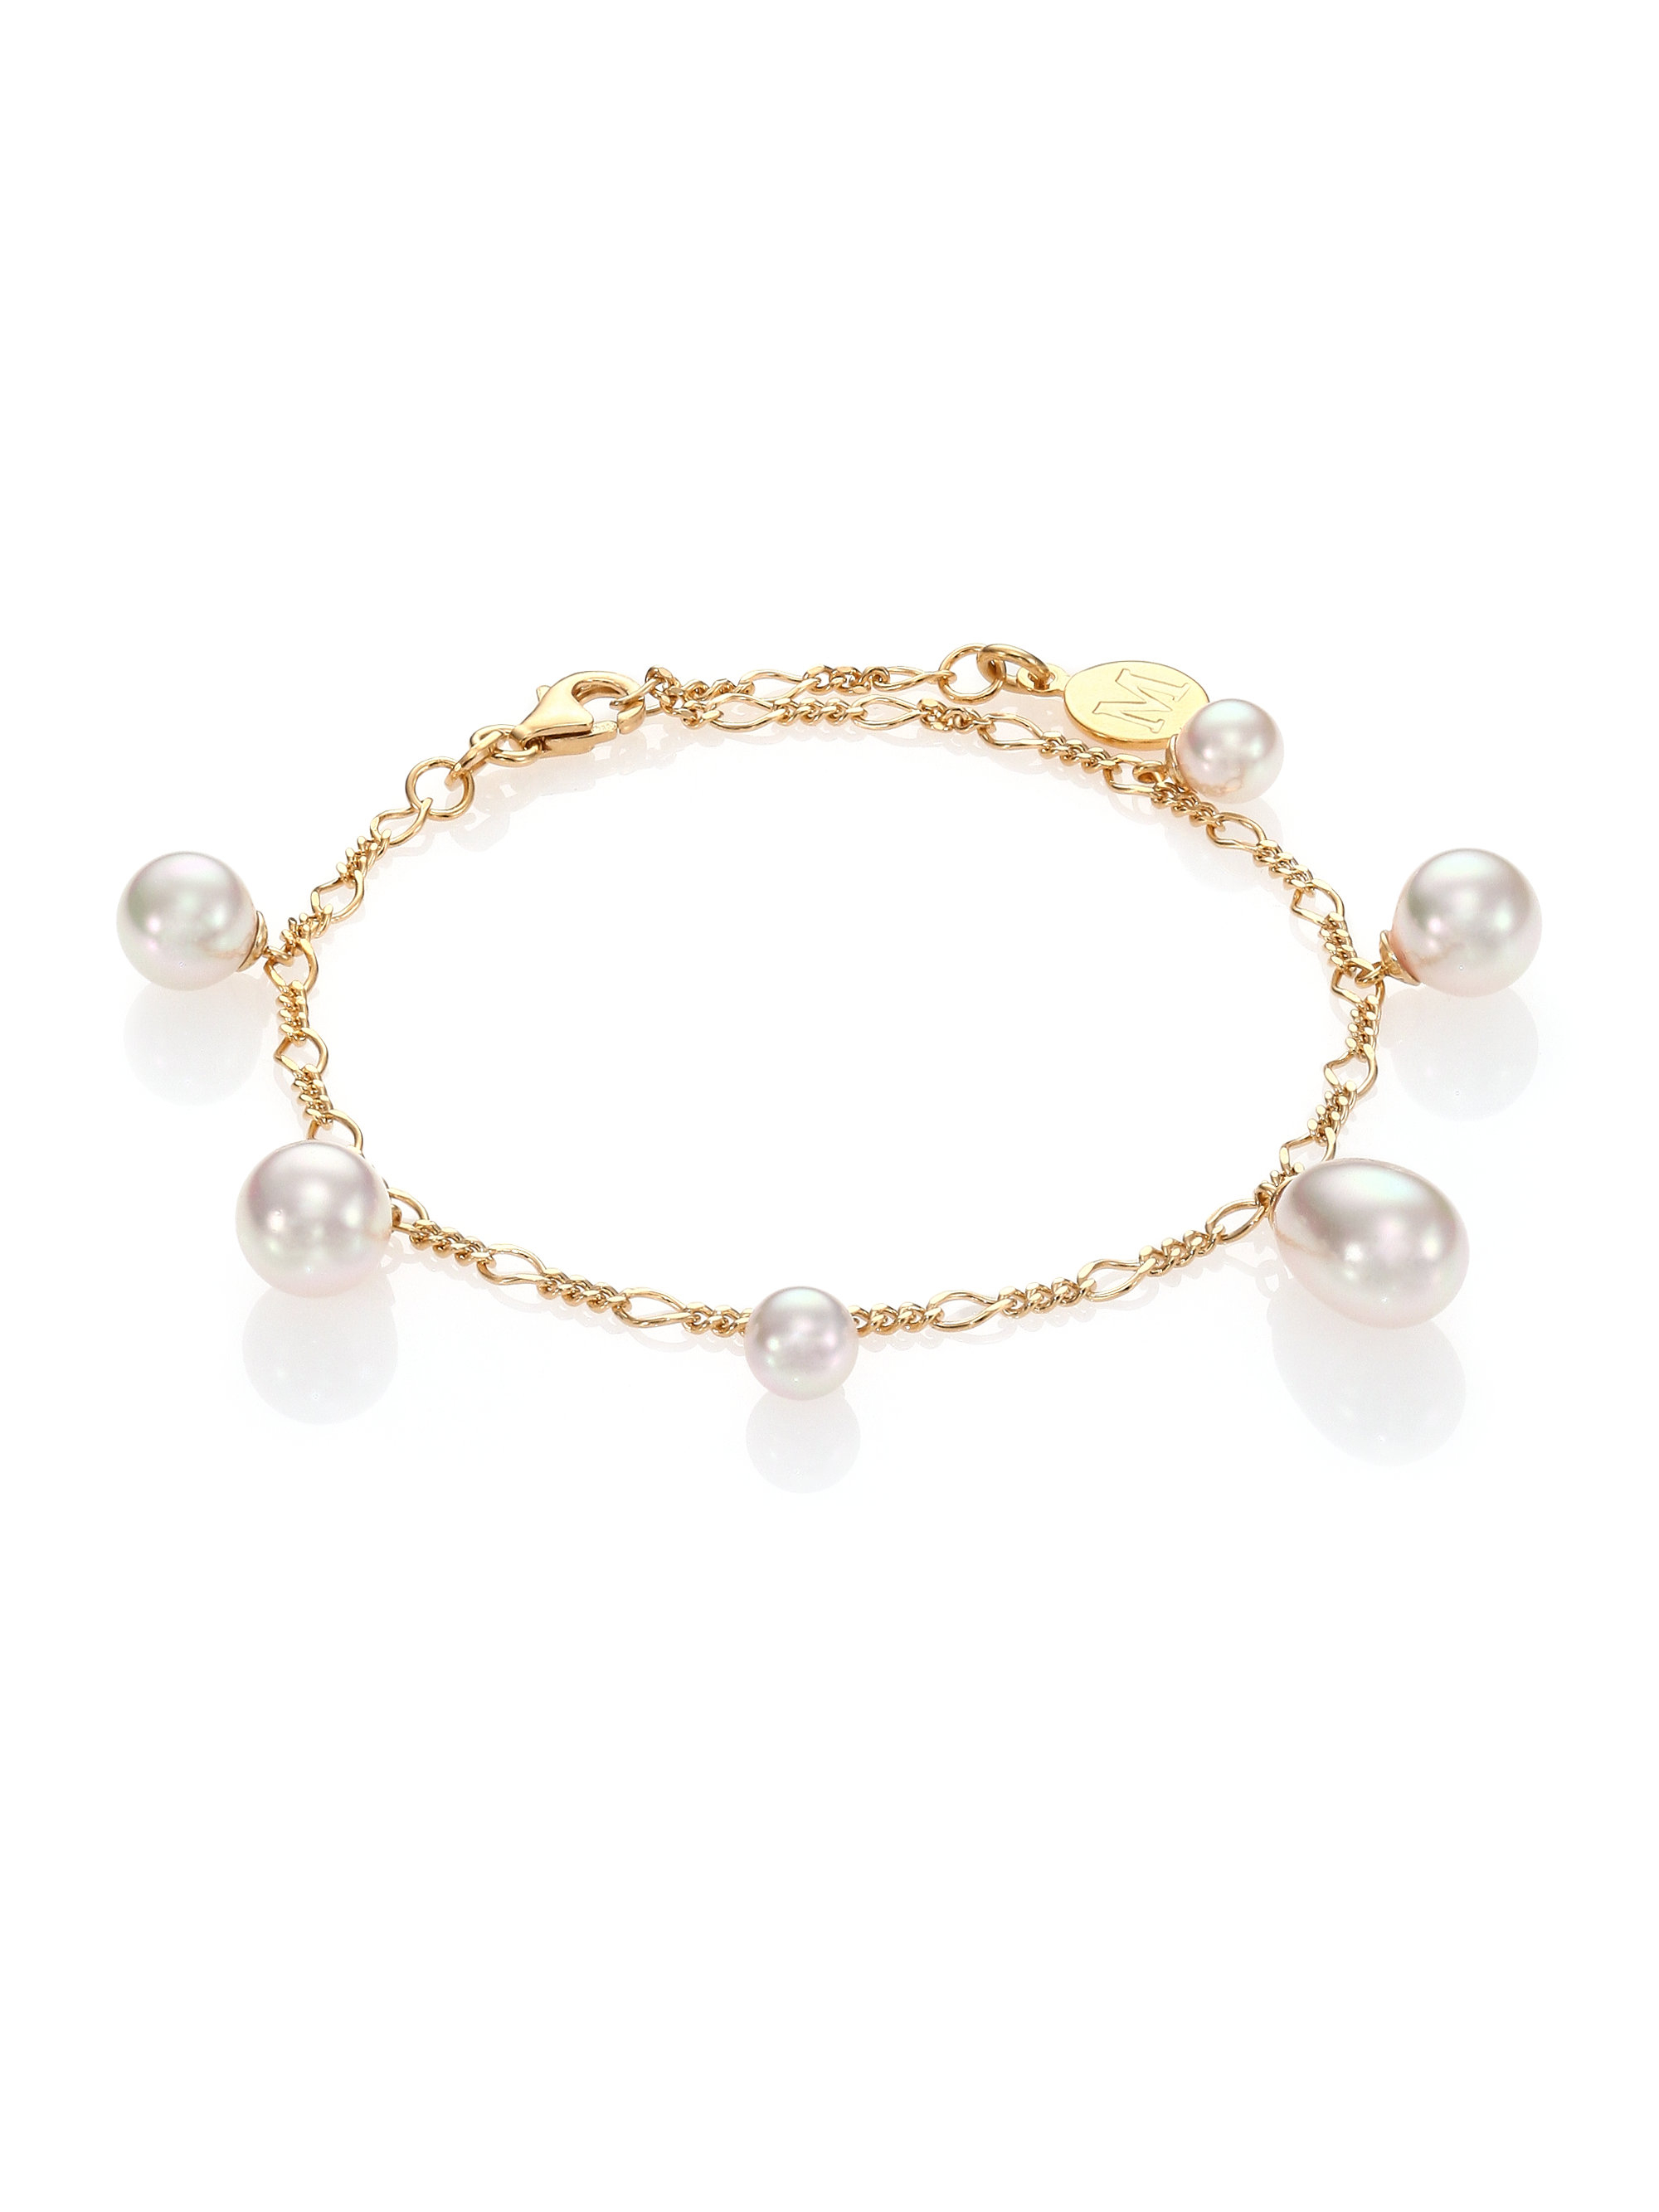 majorica rain 6mm 9mm white pearl charm bracelet in